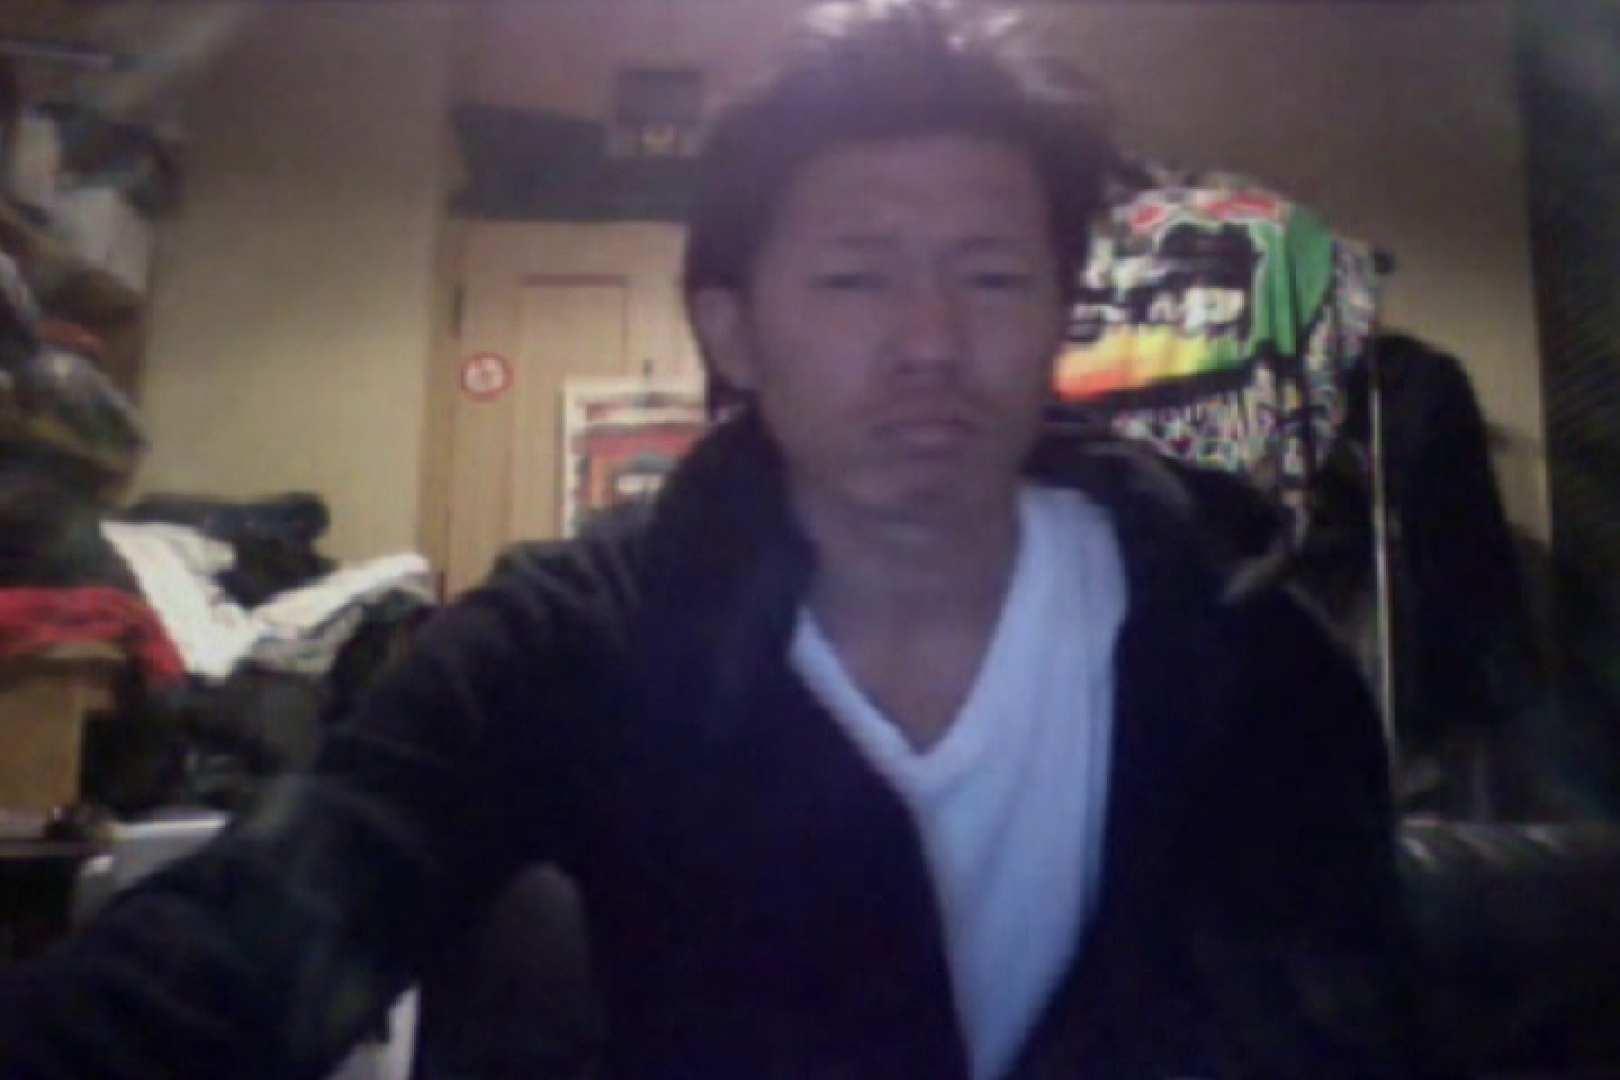 Mr.オナックスさん投稿!HD 貴方のオナニー三万円で撮影させてください。VOL.07 オナニー編 ゲイセックス画像 107枚 27